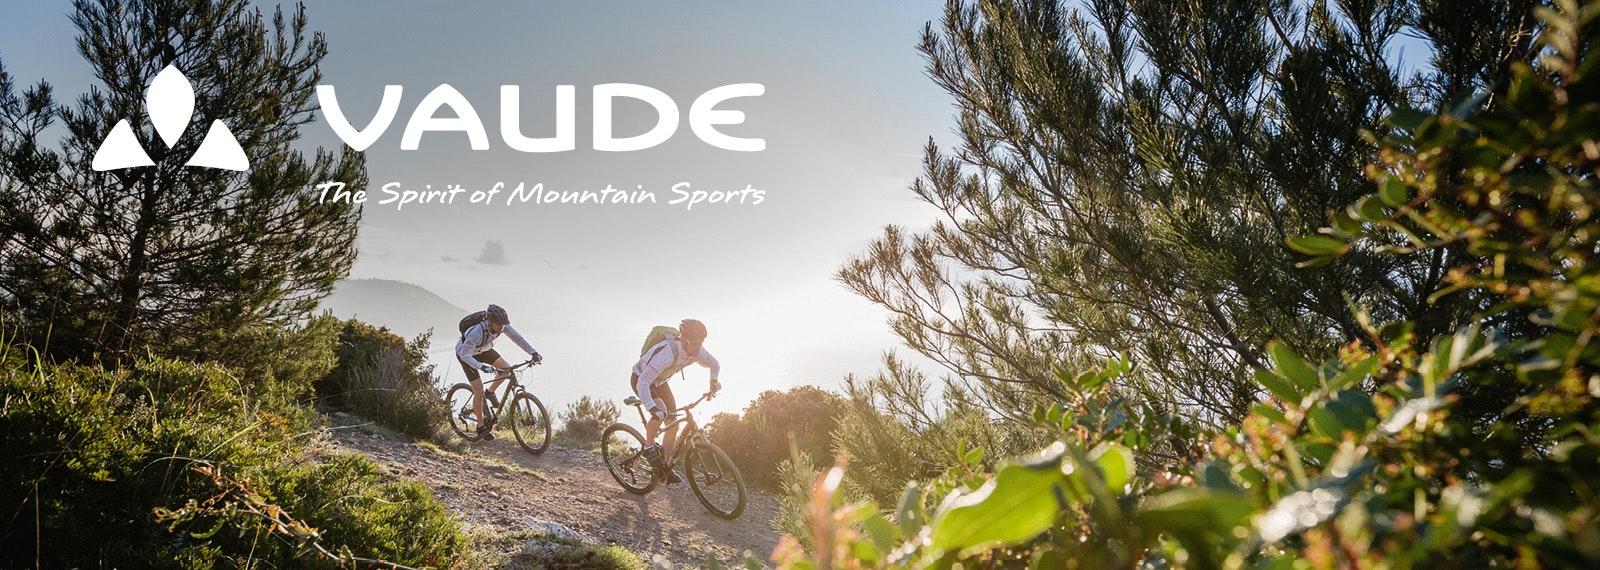 VAUDE Kollektion 2017 | BikeExchange